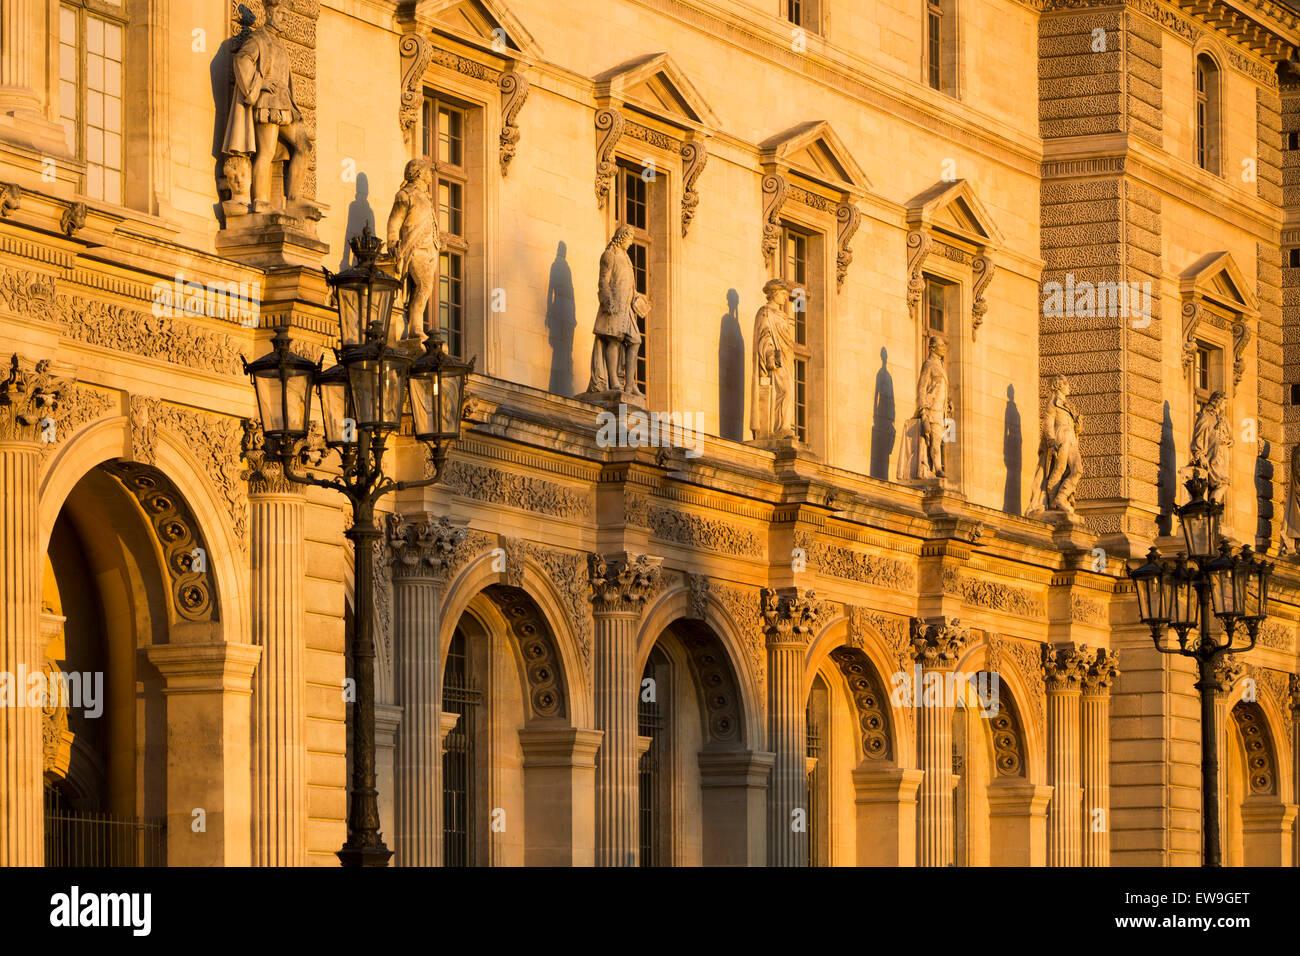 Atardecer en estatuas a lo largo de la pared exterior del Musée du Louvre, Paris, Francia Imagen De Stock